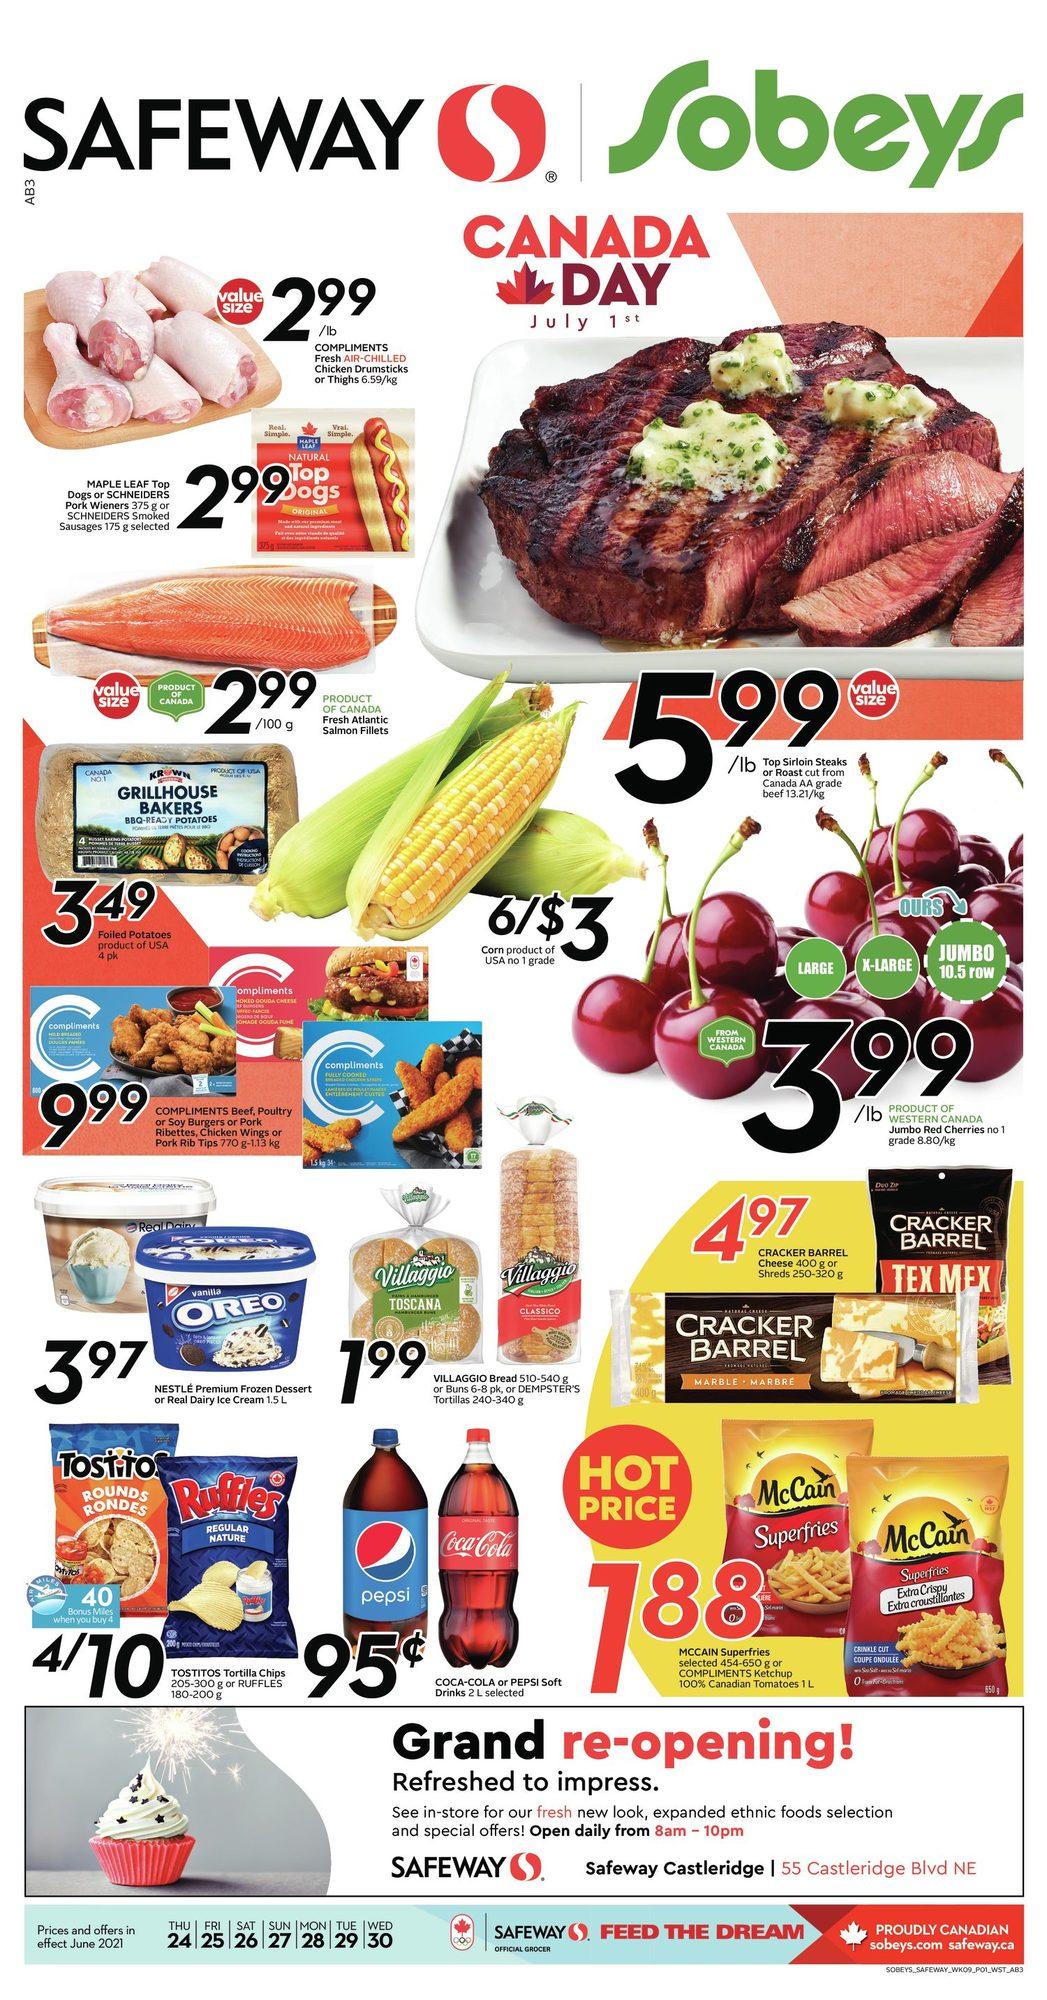 Safeway - Weekly Flyer Specials